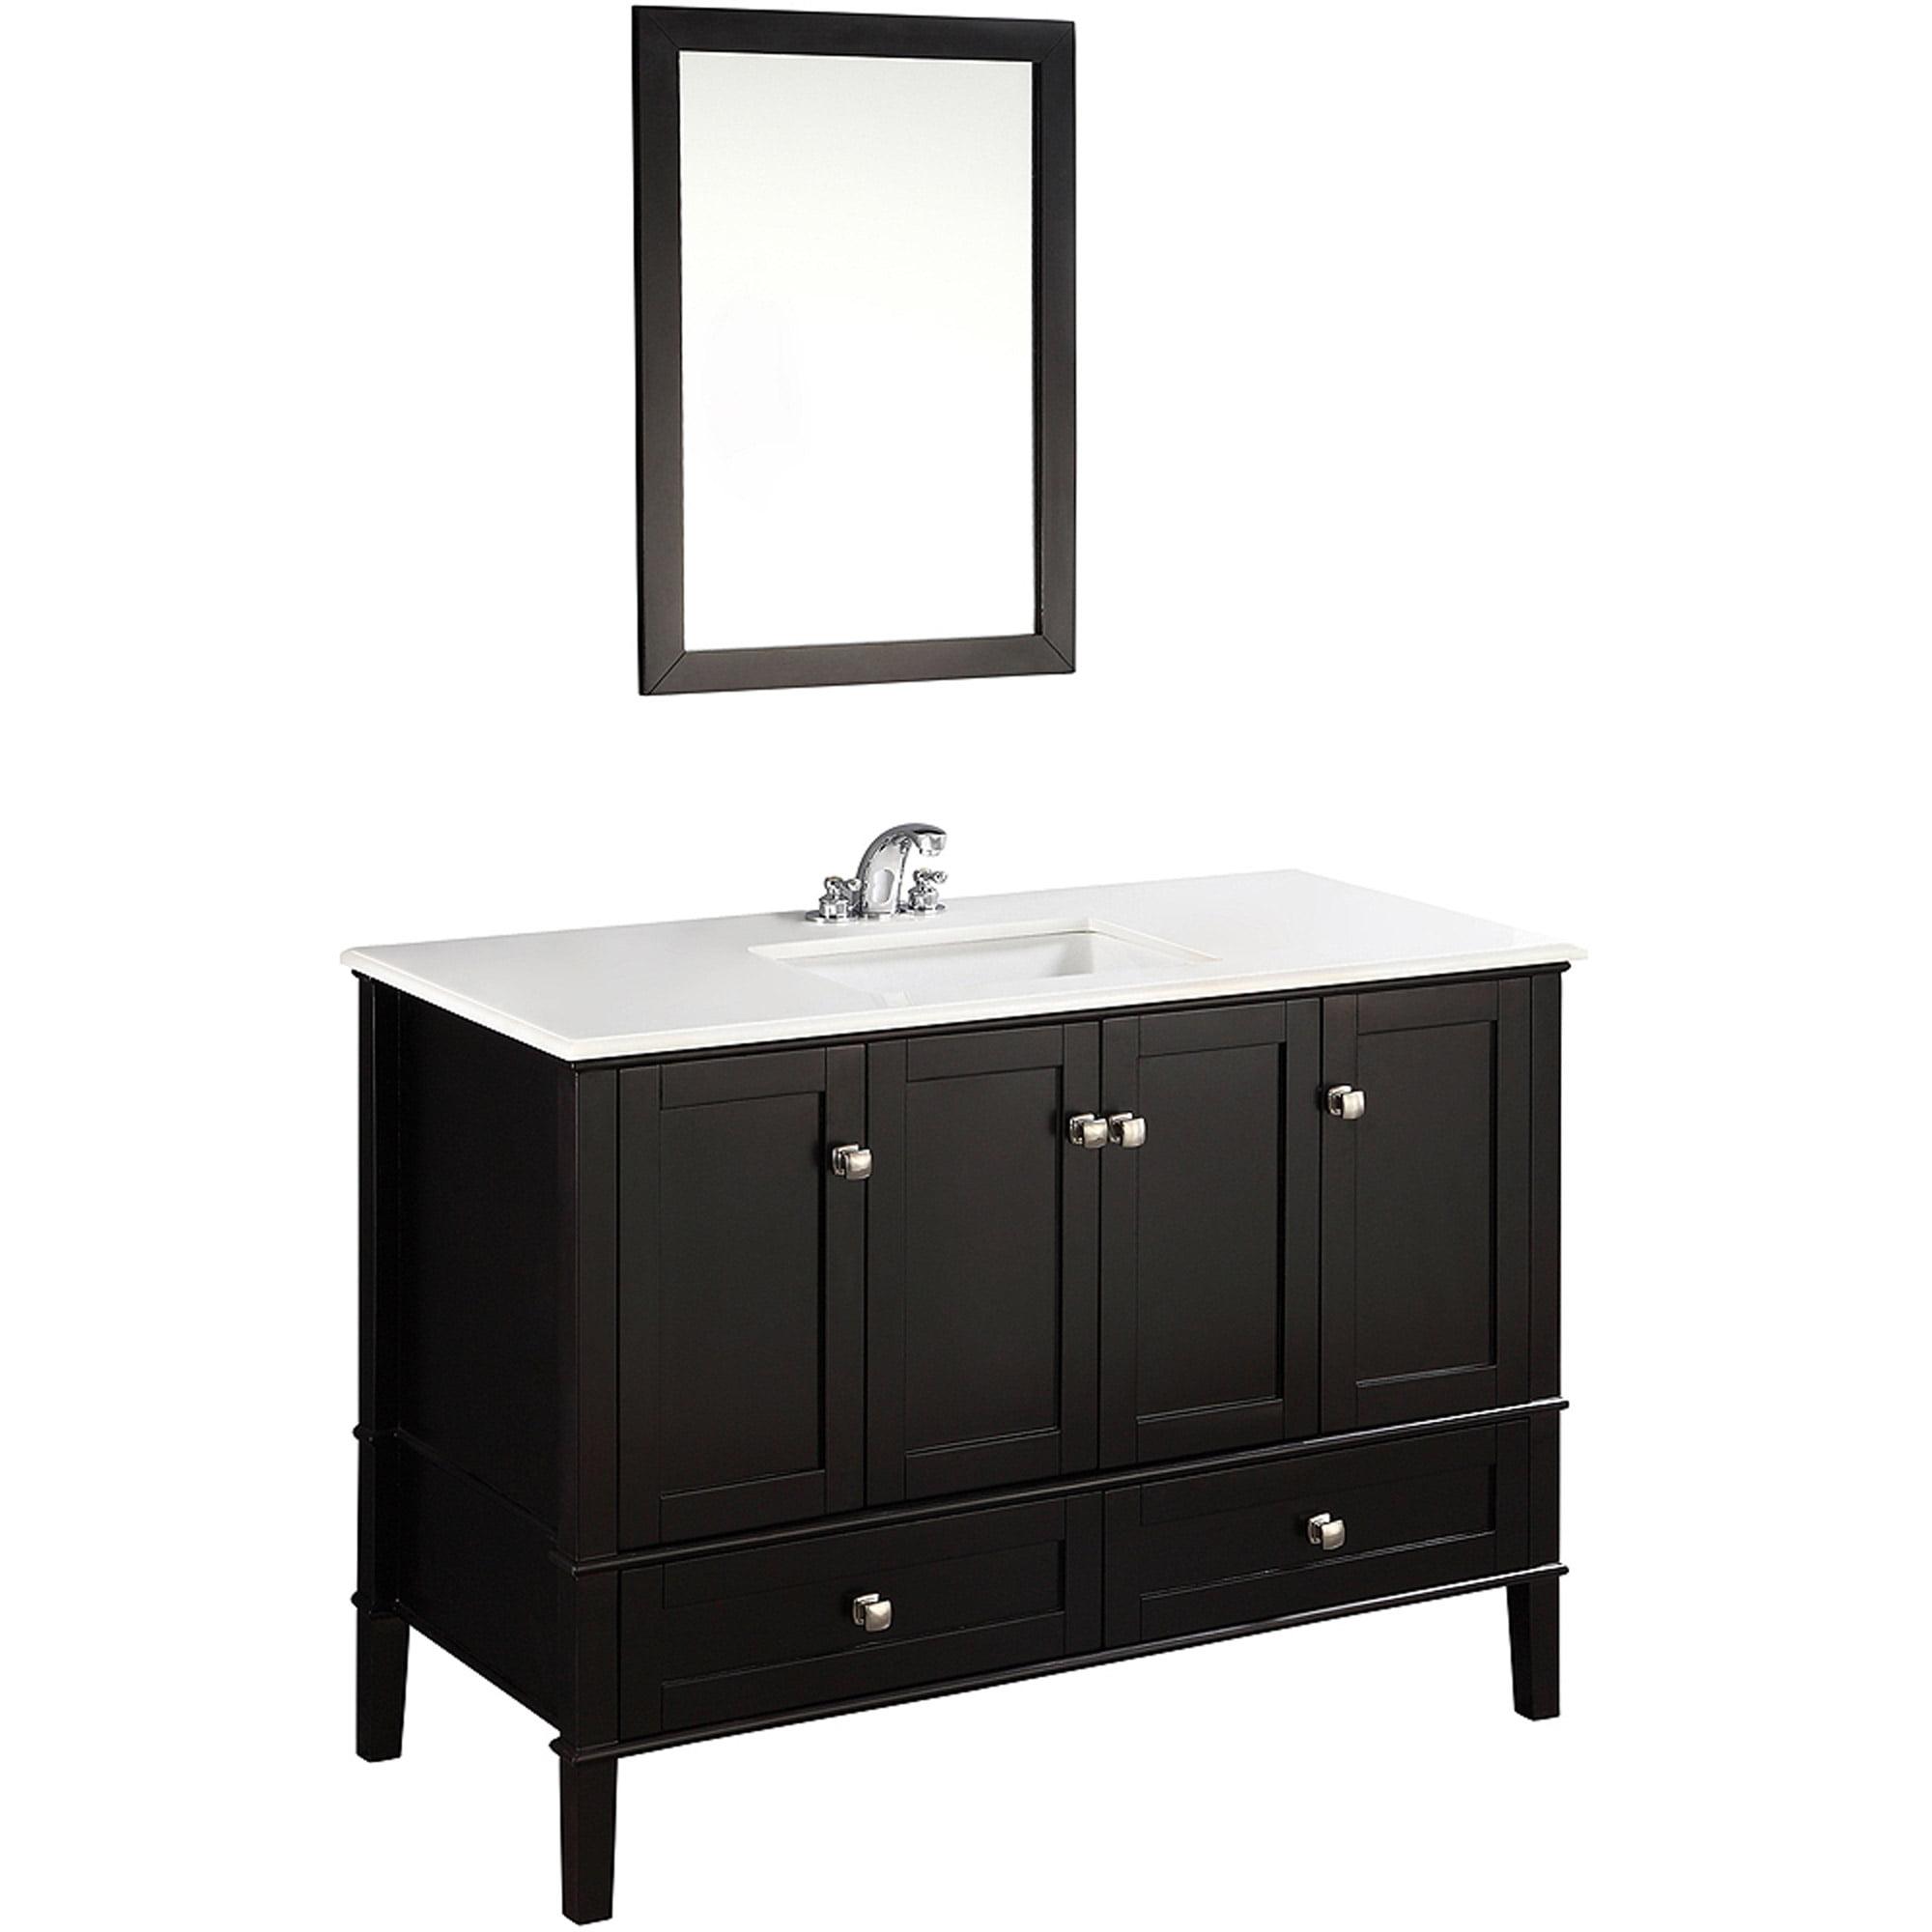 "Brooklyn + Max Chesapeake 48"" Black Bath Vanity - Walmart.com"